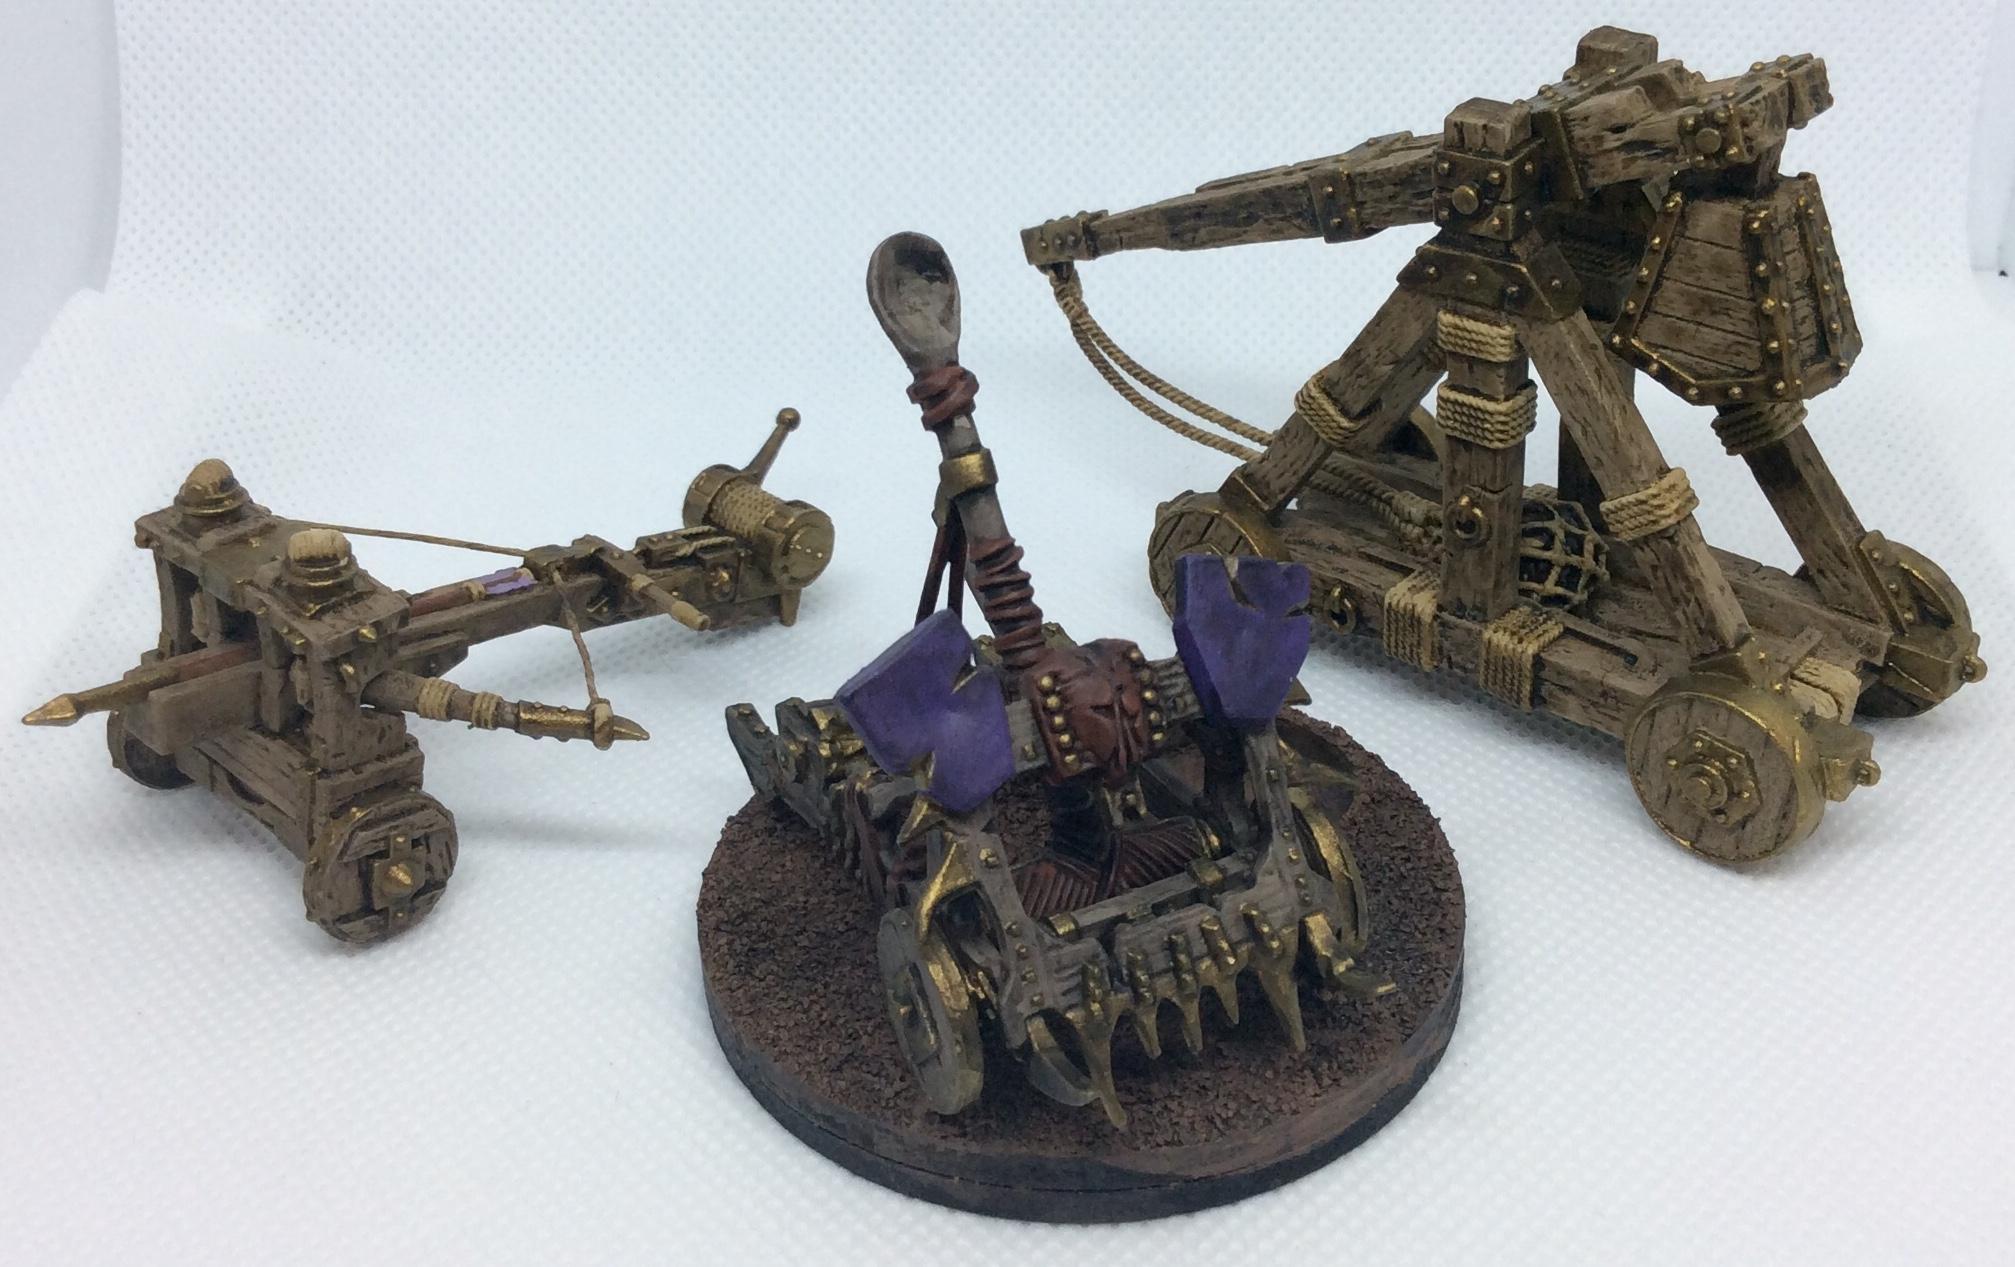 Balefire Catapult, Batista, Catapult, Siege Engine, Trebuchet